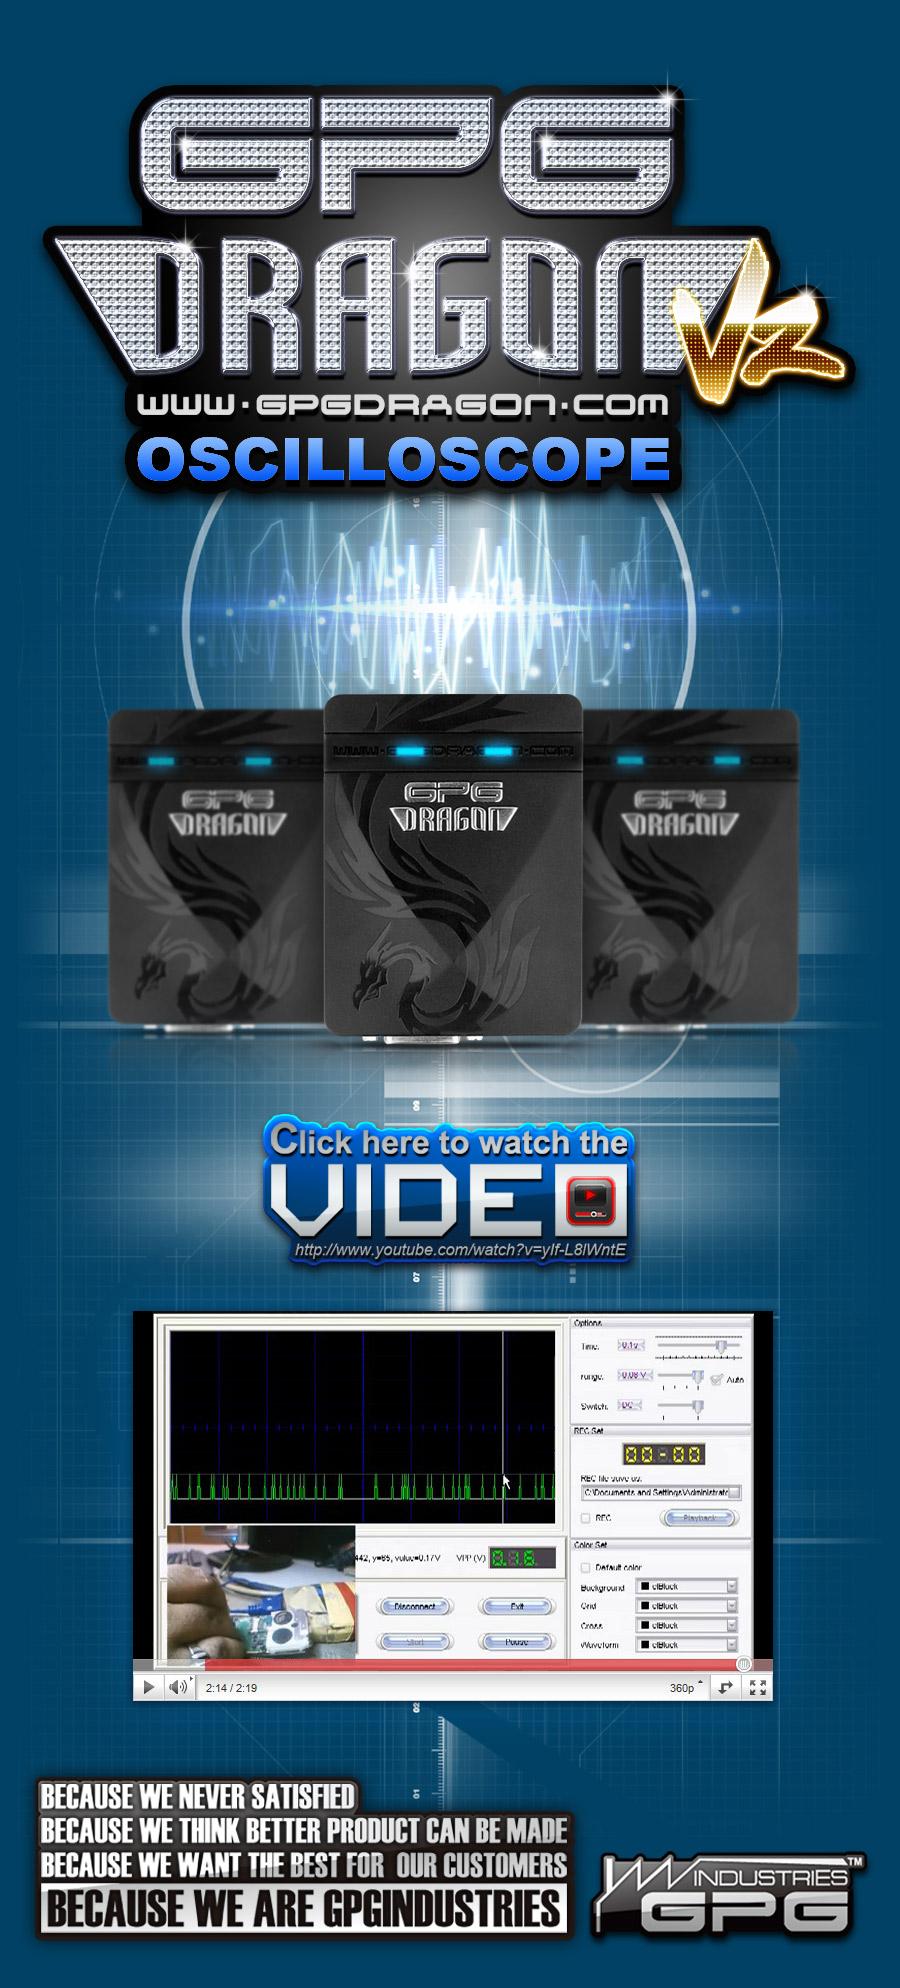 2011 06 20 GPGdragon Oscilloscope